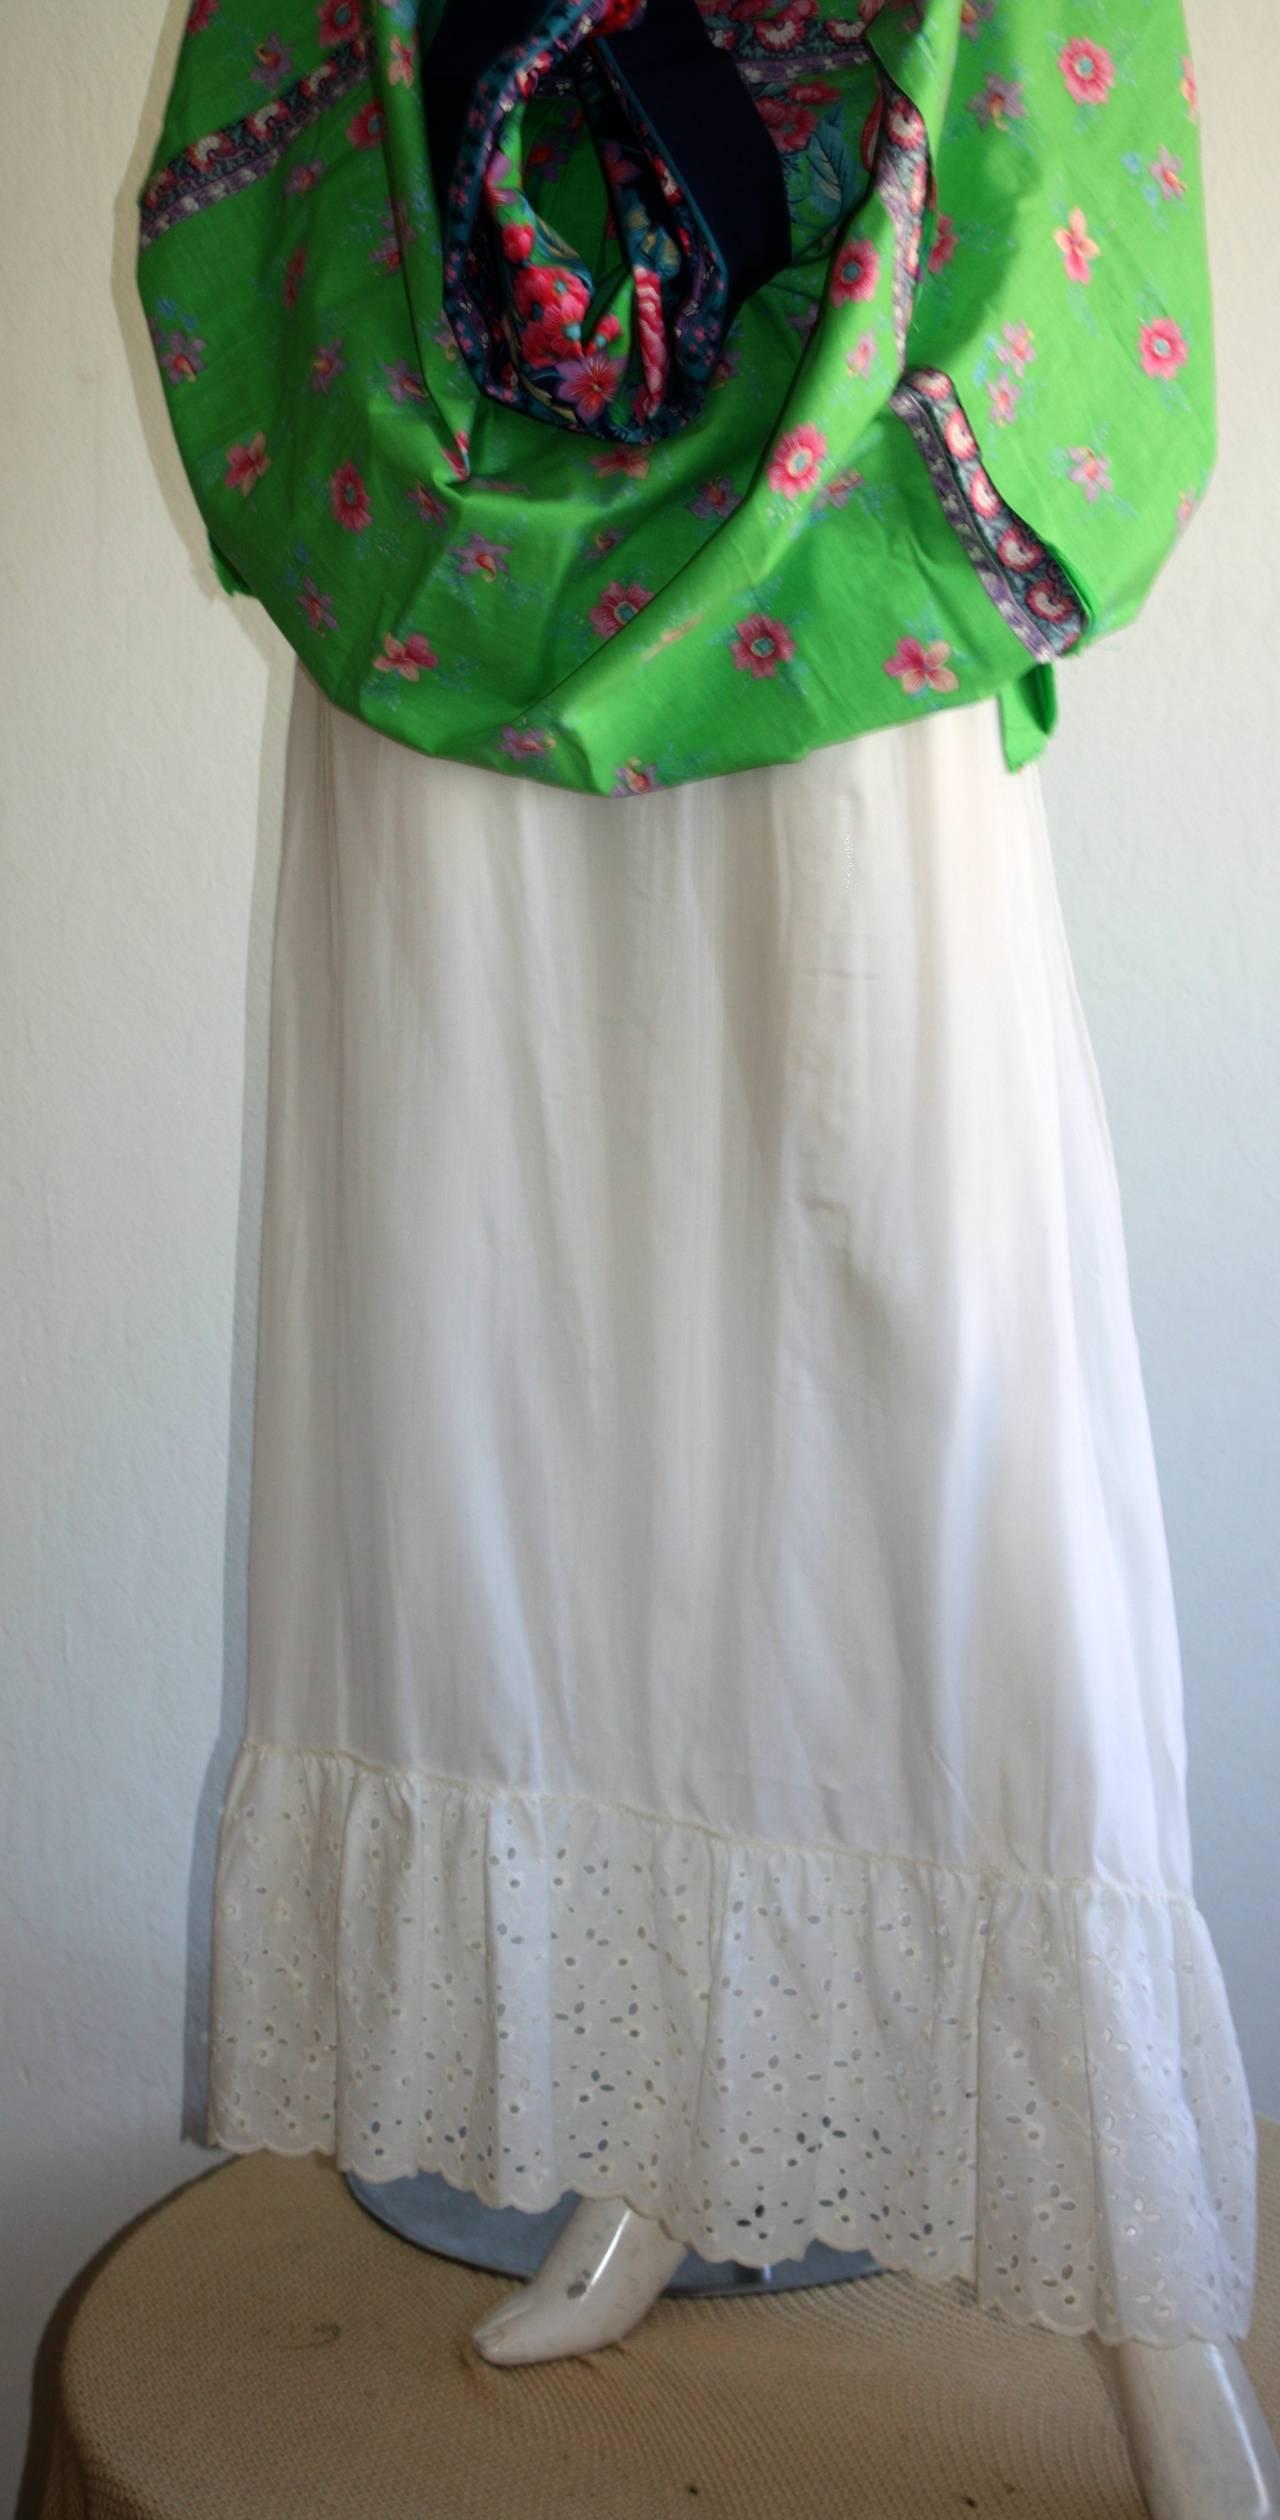 1960s Vintage Tina Leser Green Floral Print 2 - Piece Dress Ensemble For Sale 3